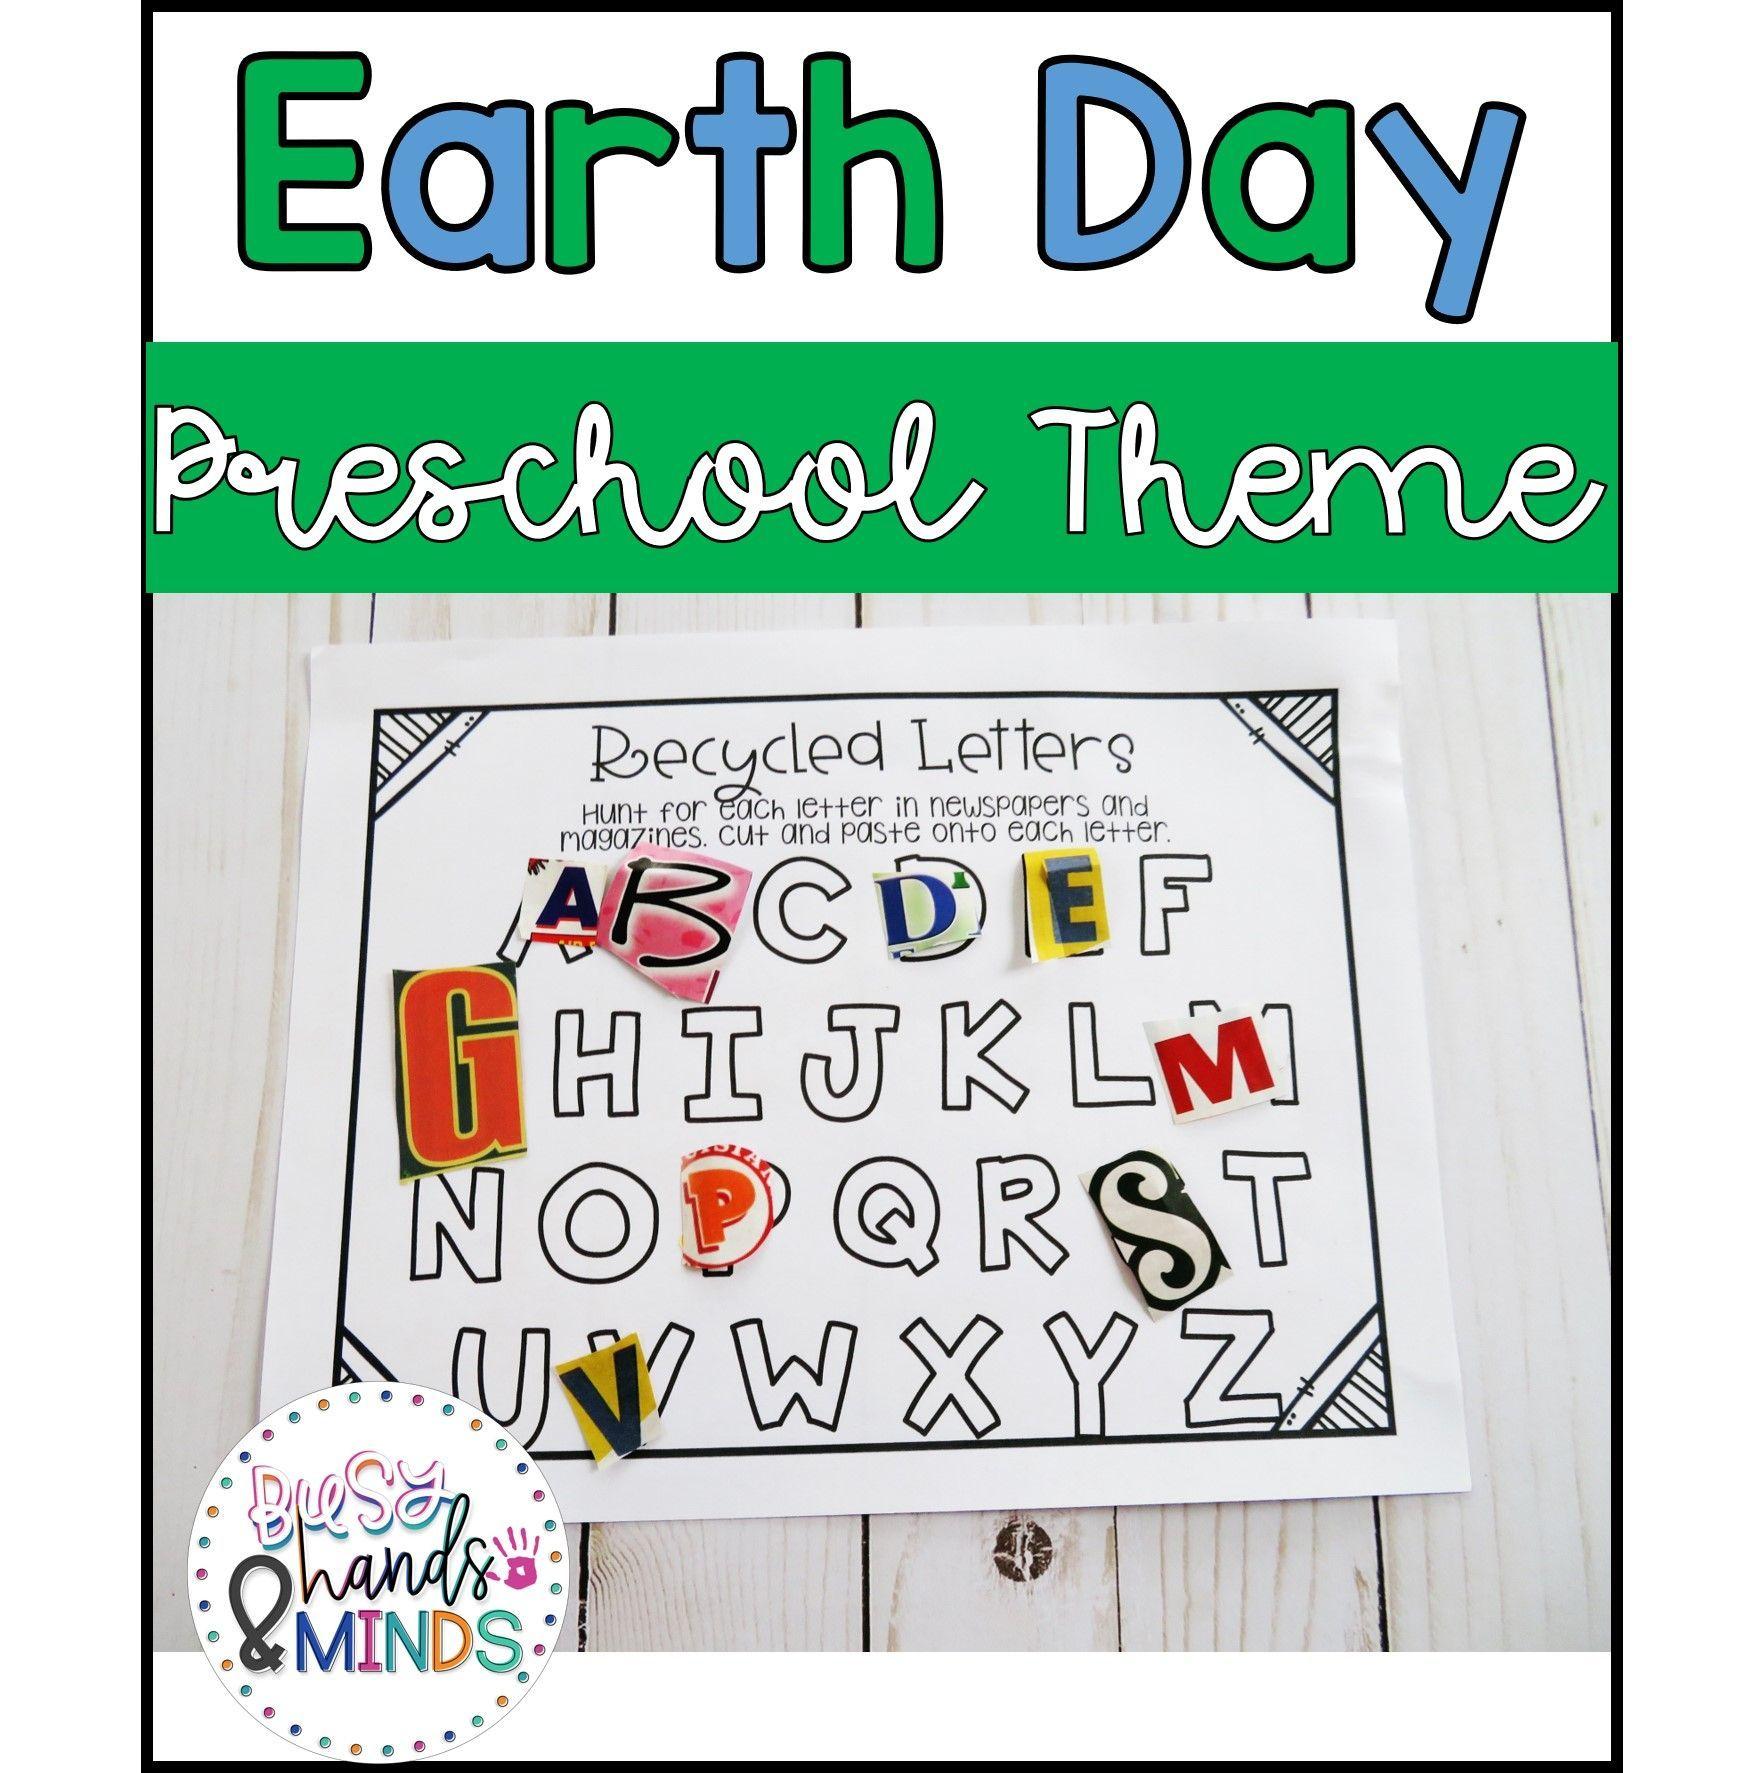 Earth Day Preschool Theme In